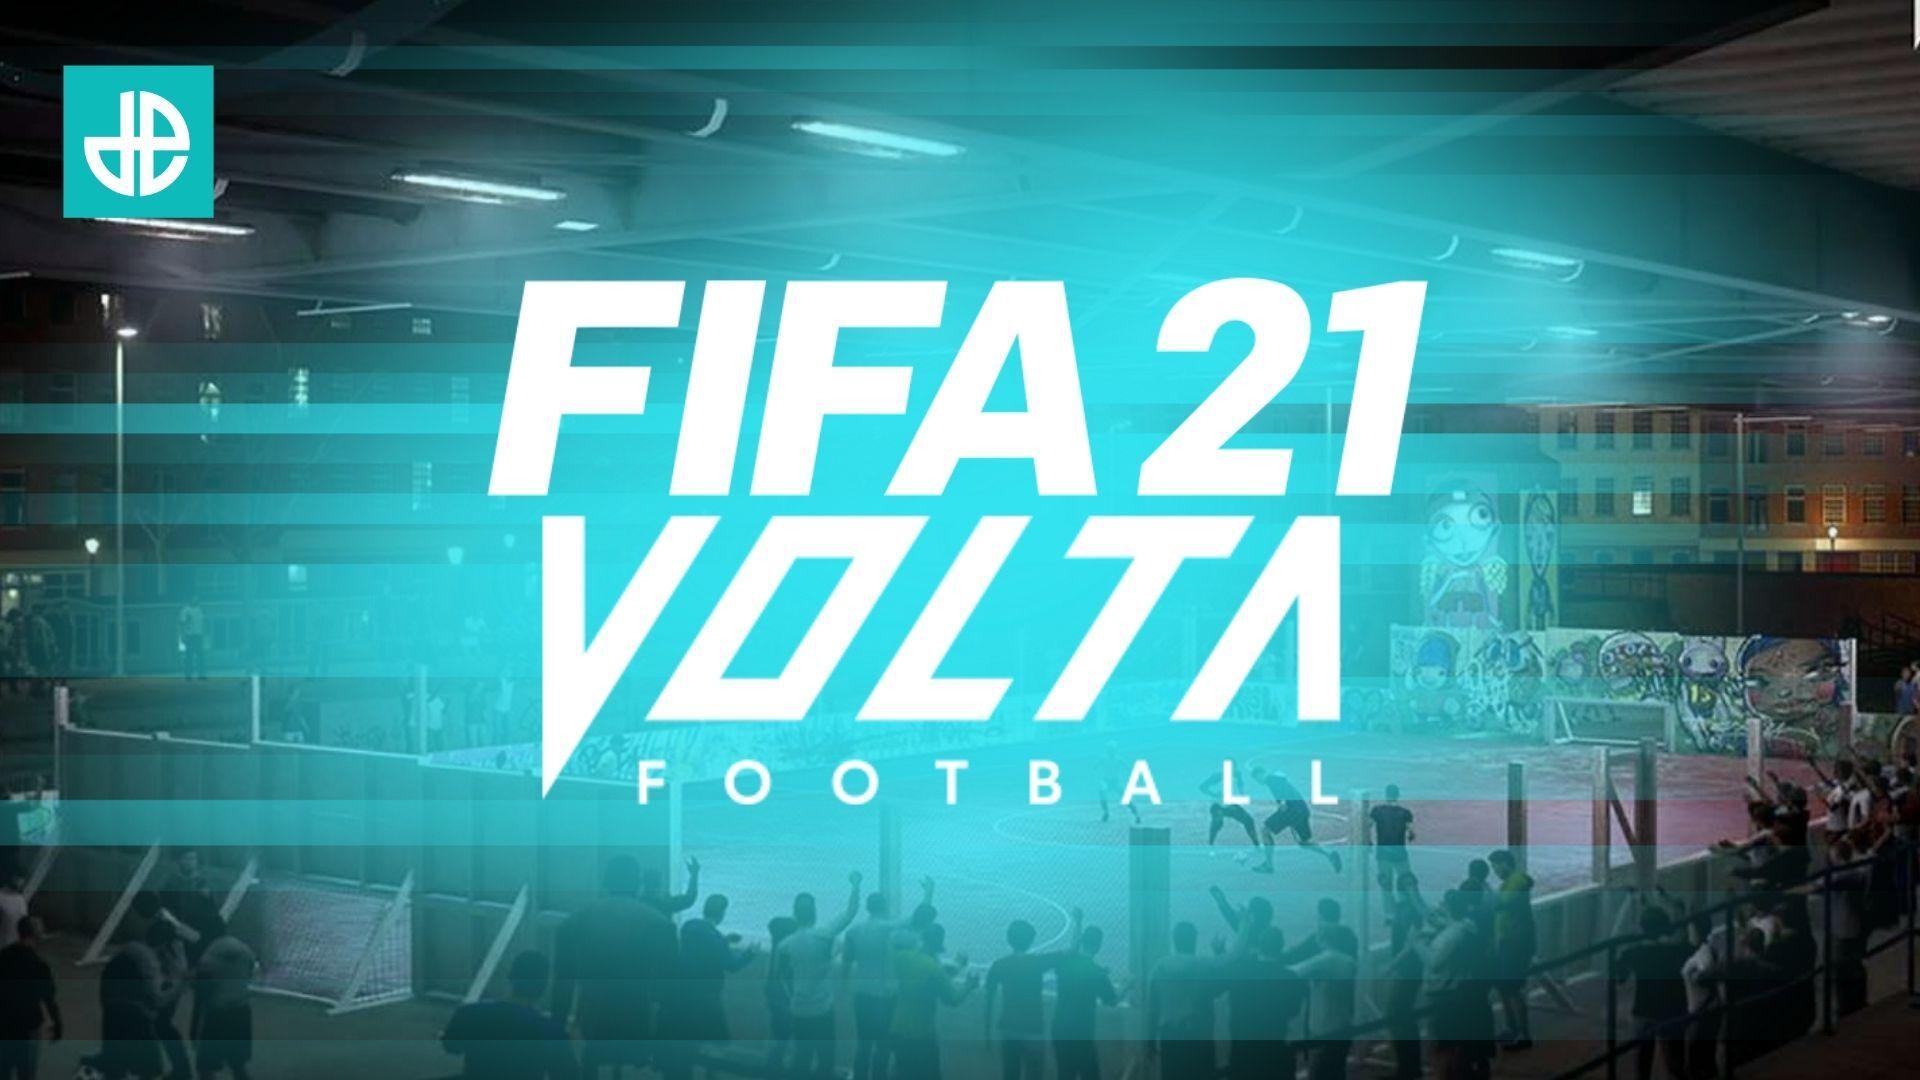 FIFA 21 Volta Football